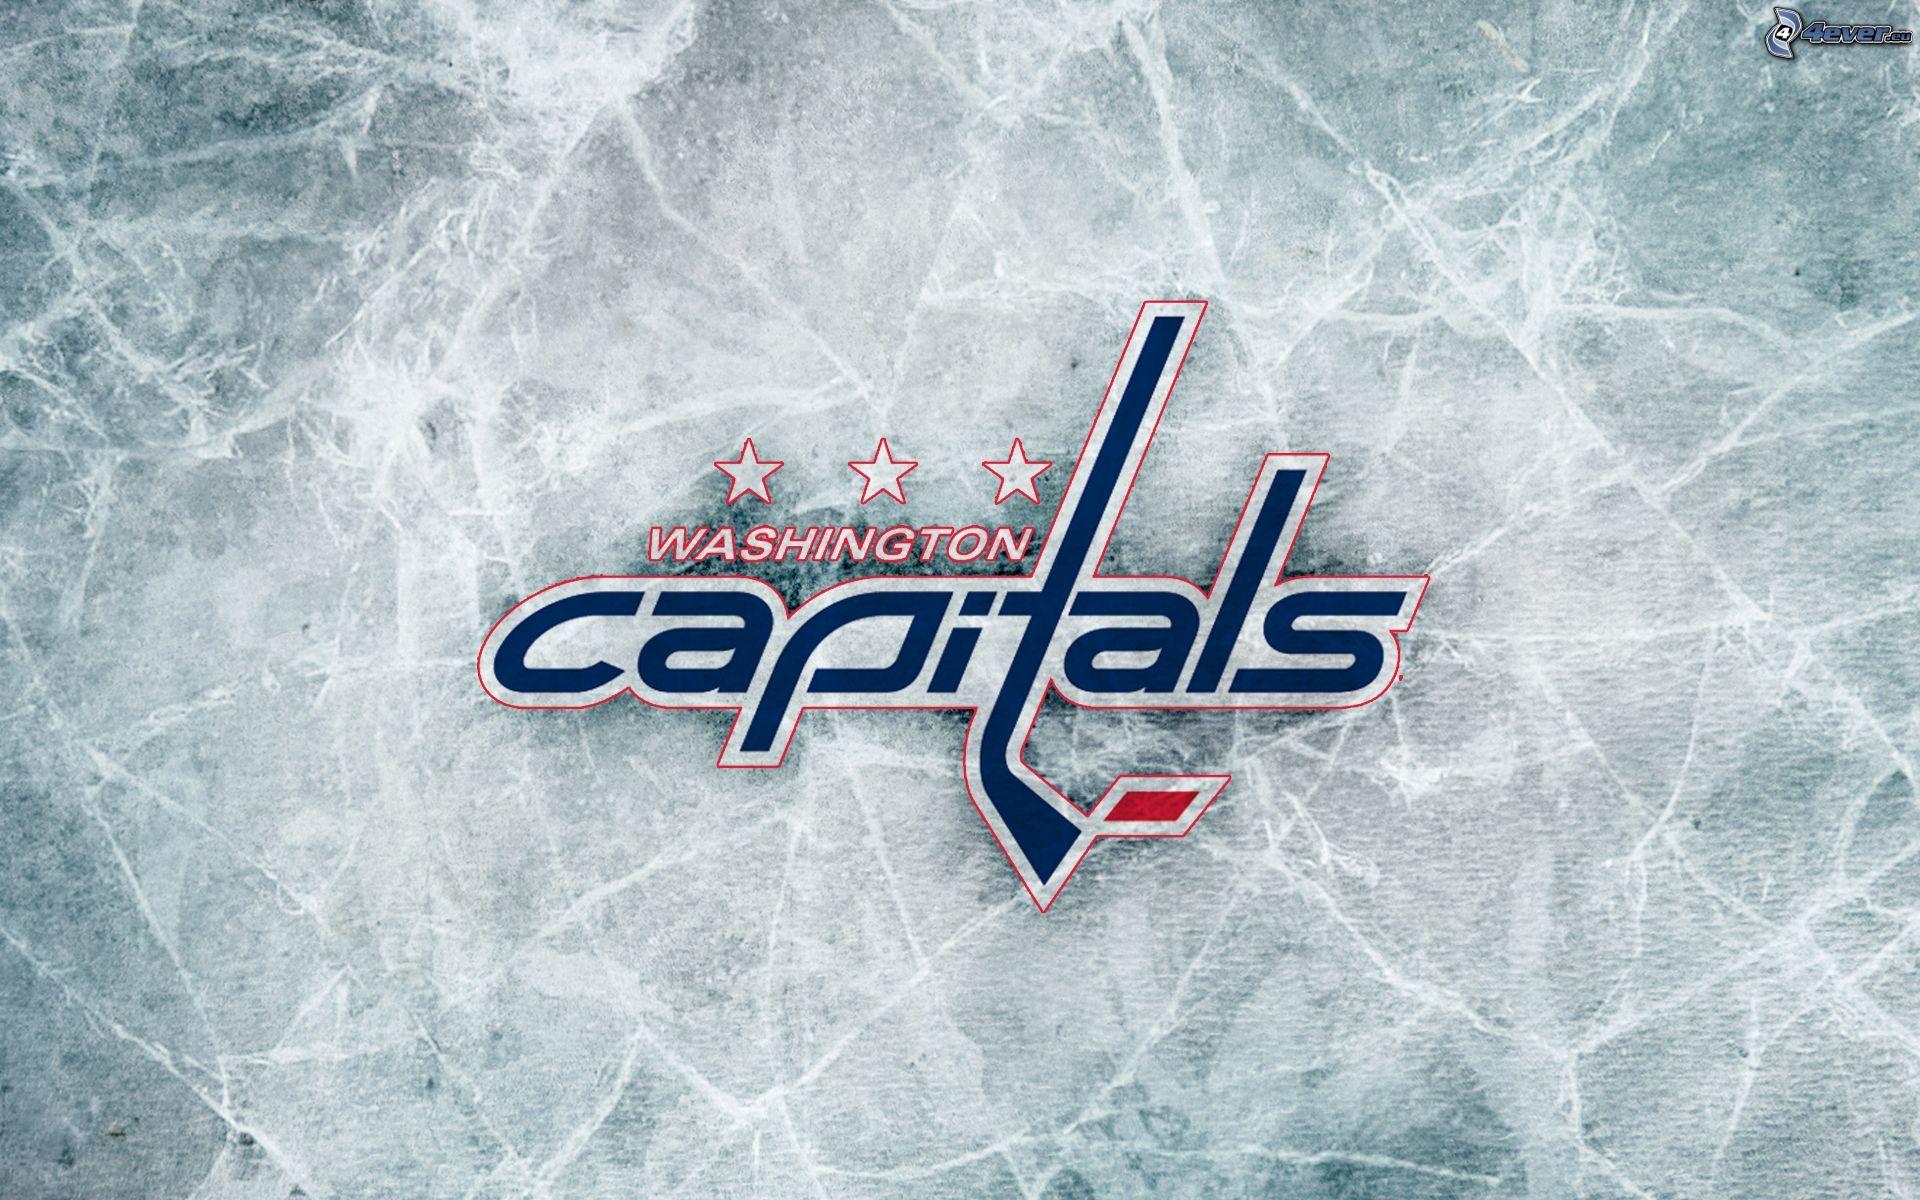 Washington Capitals 127489